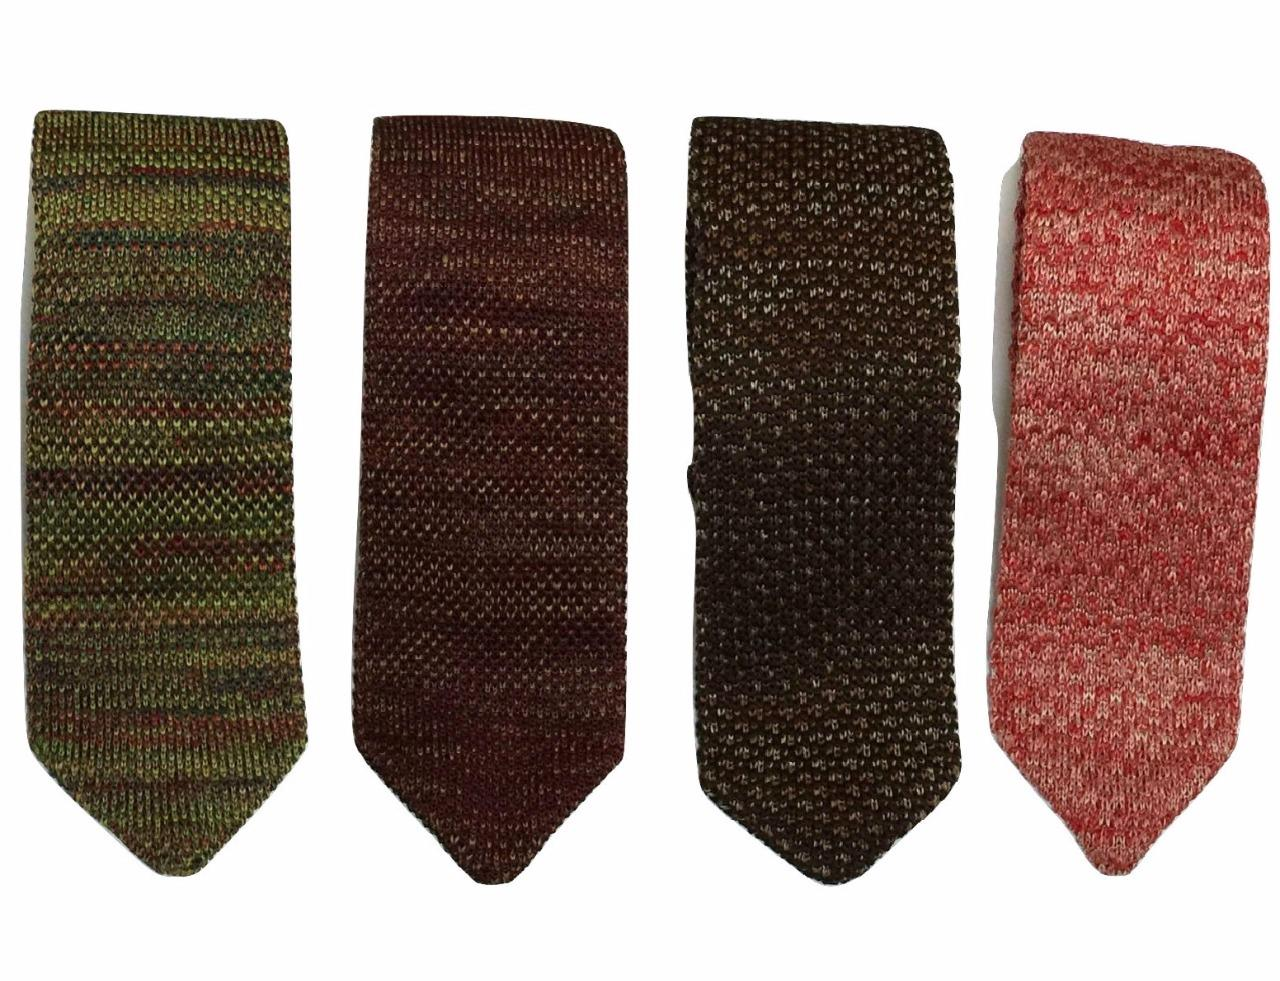 DQT Homme Tricot 7cm Slim Cravate